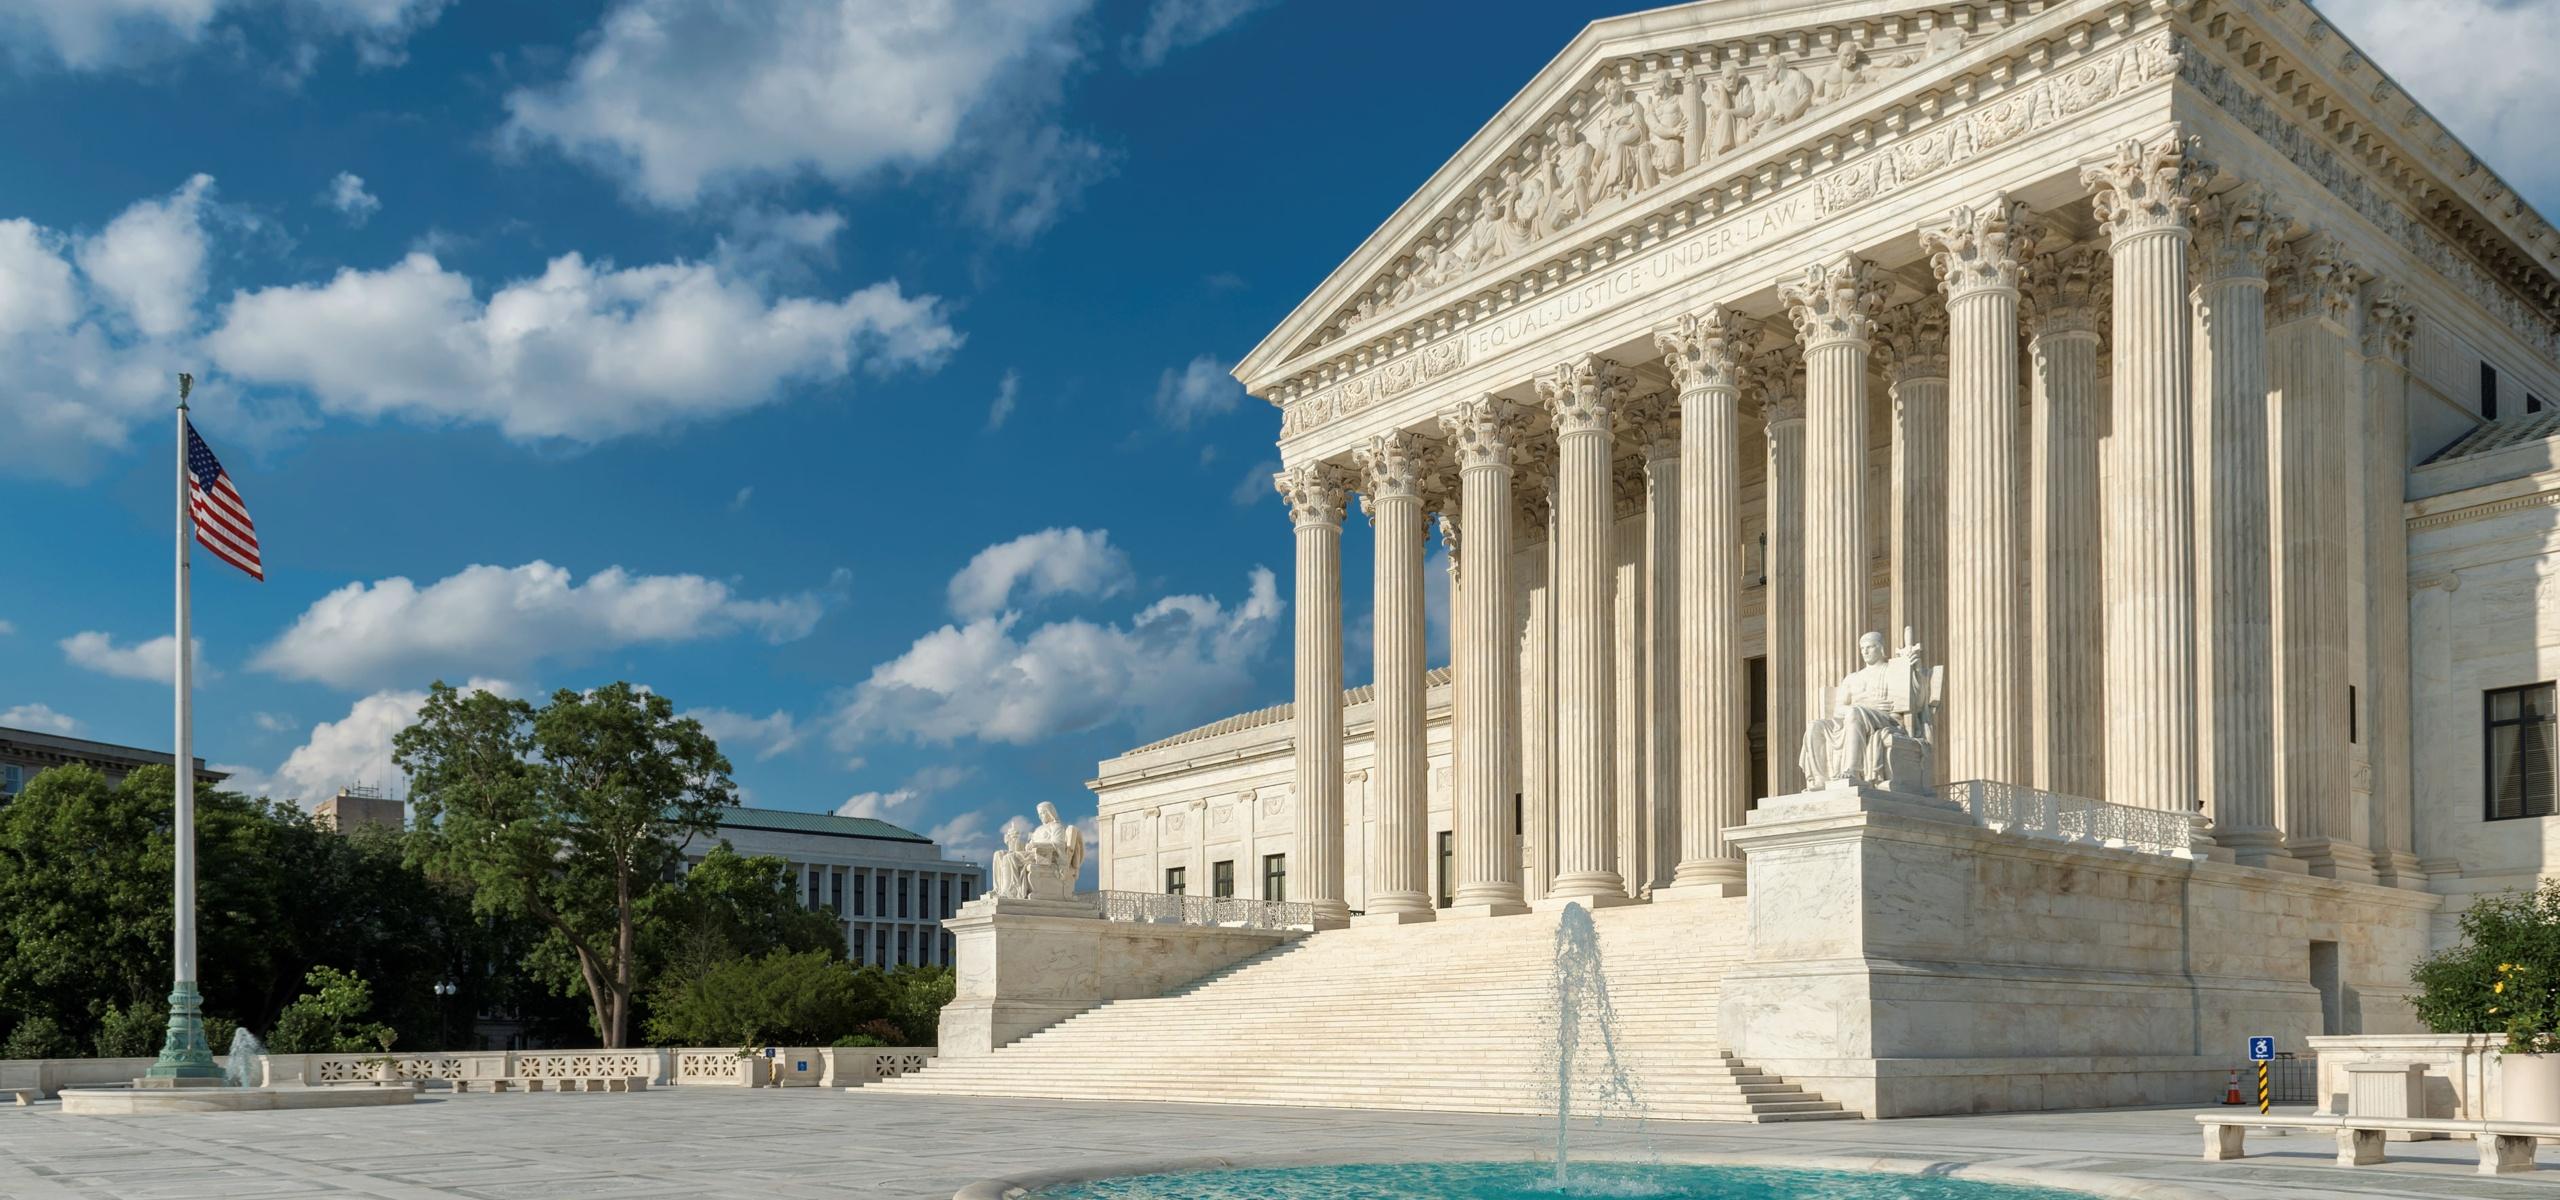 Sessions v. Dimaya: Refusing to Leave